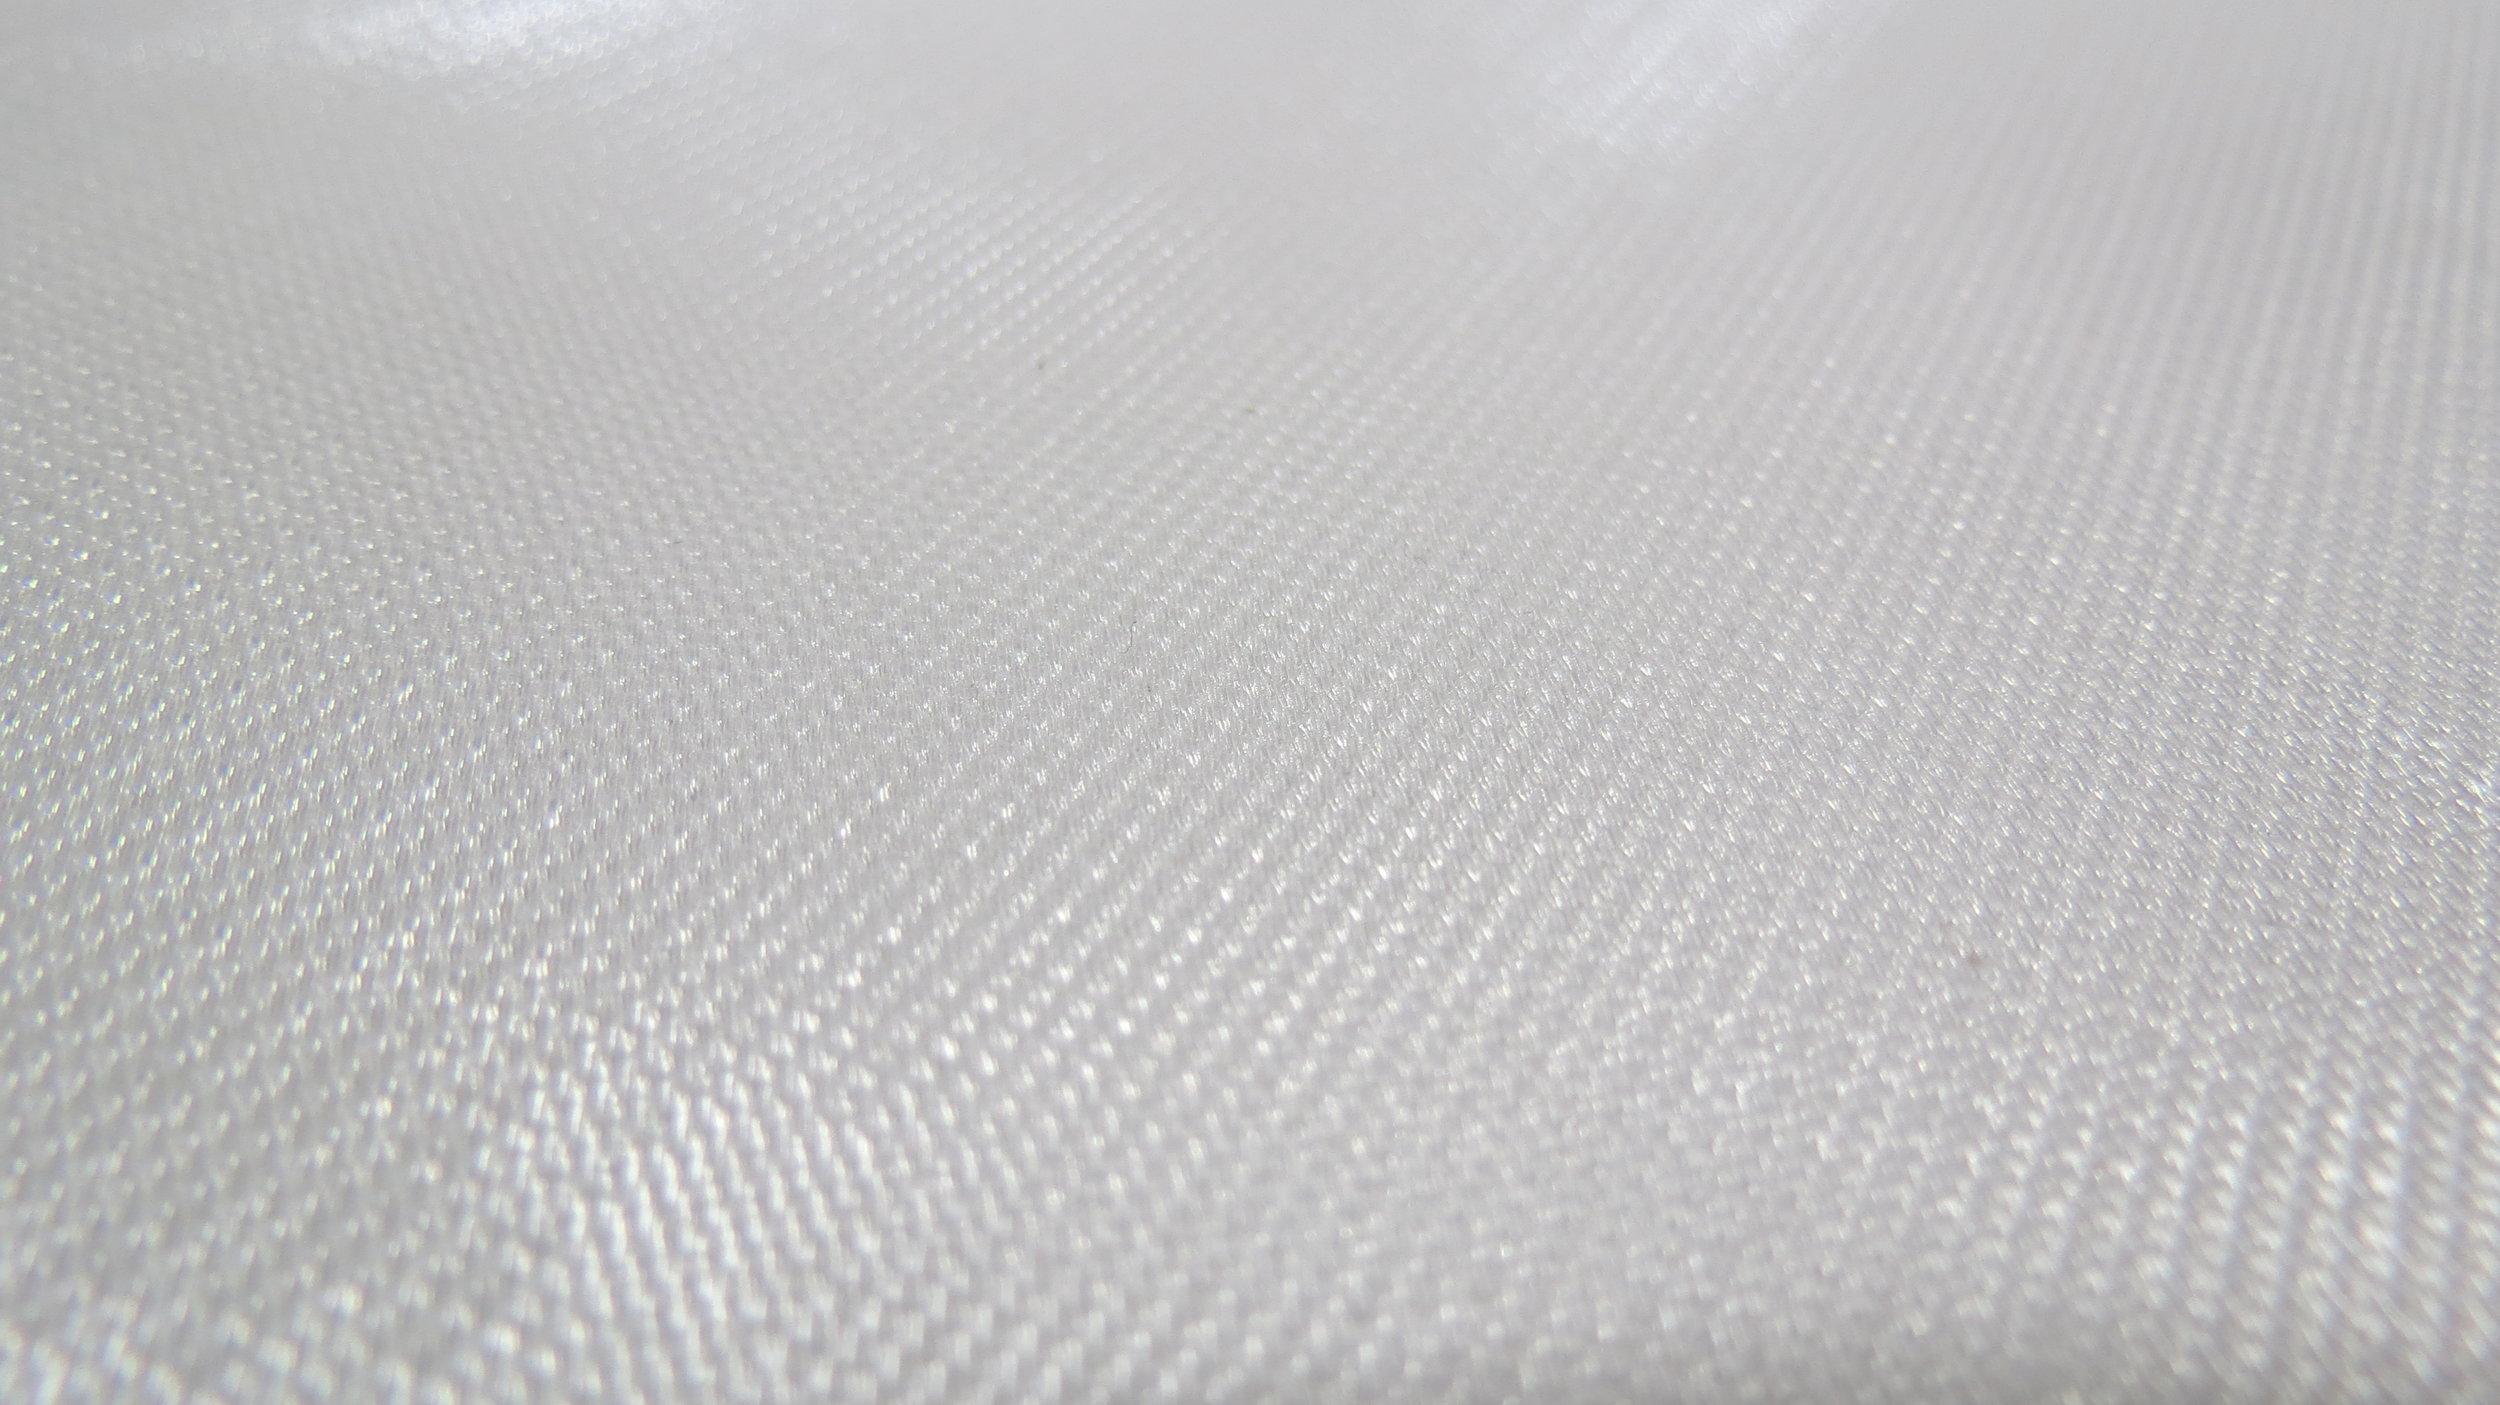 Polypropylene Monofilament Cloth